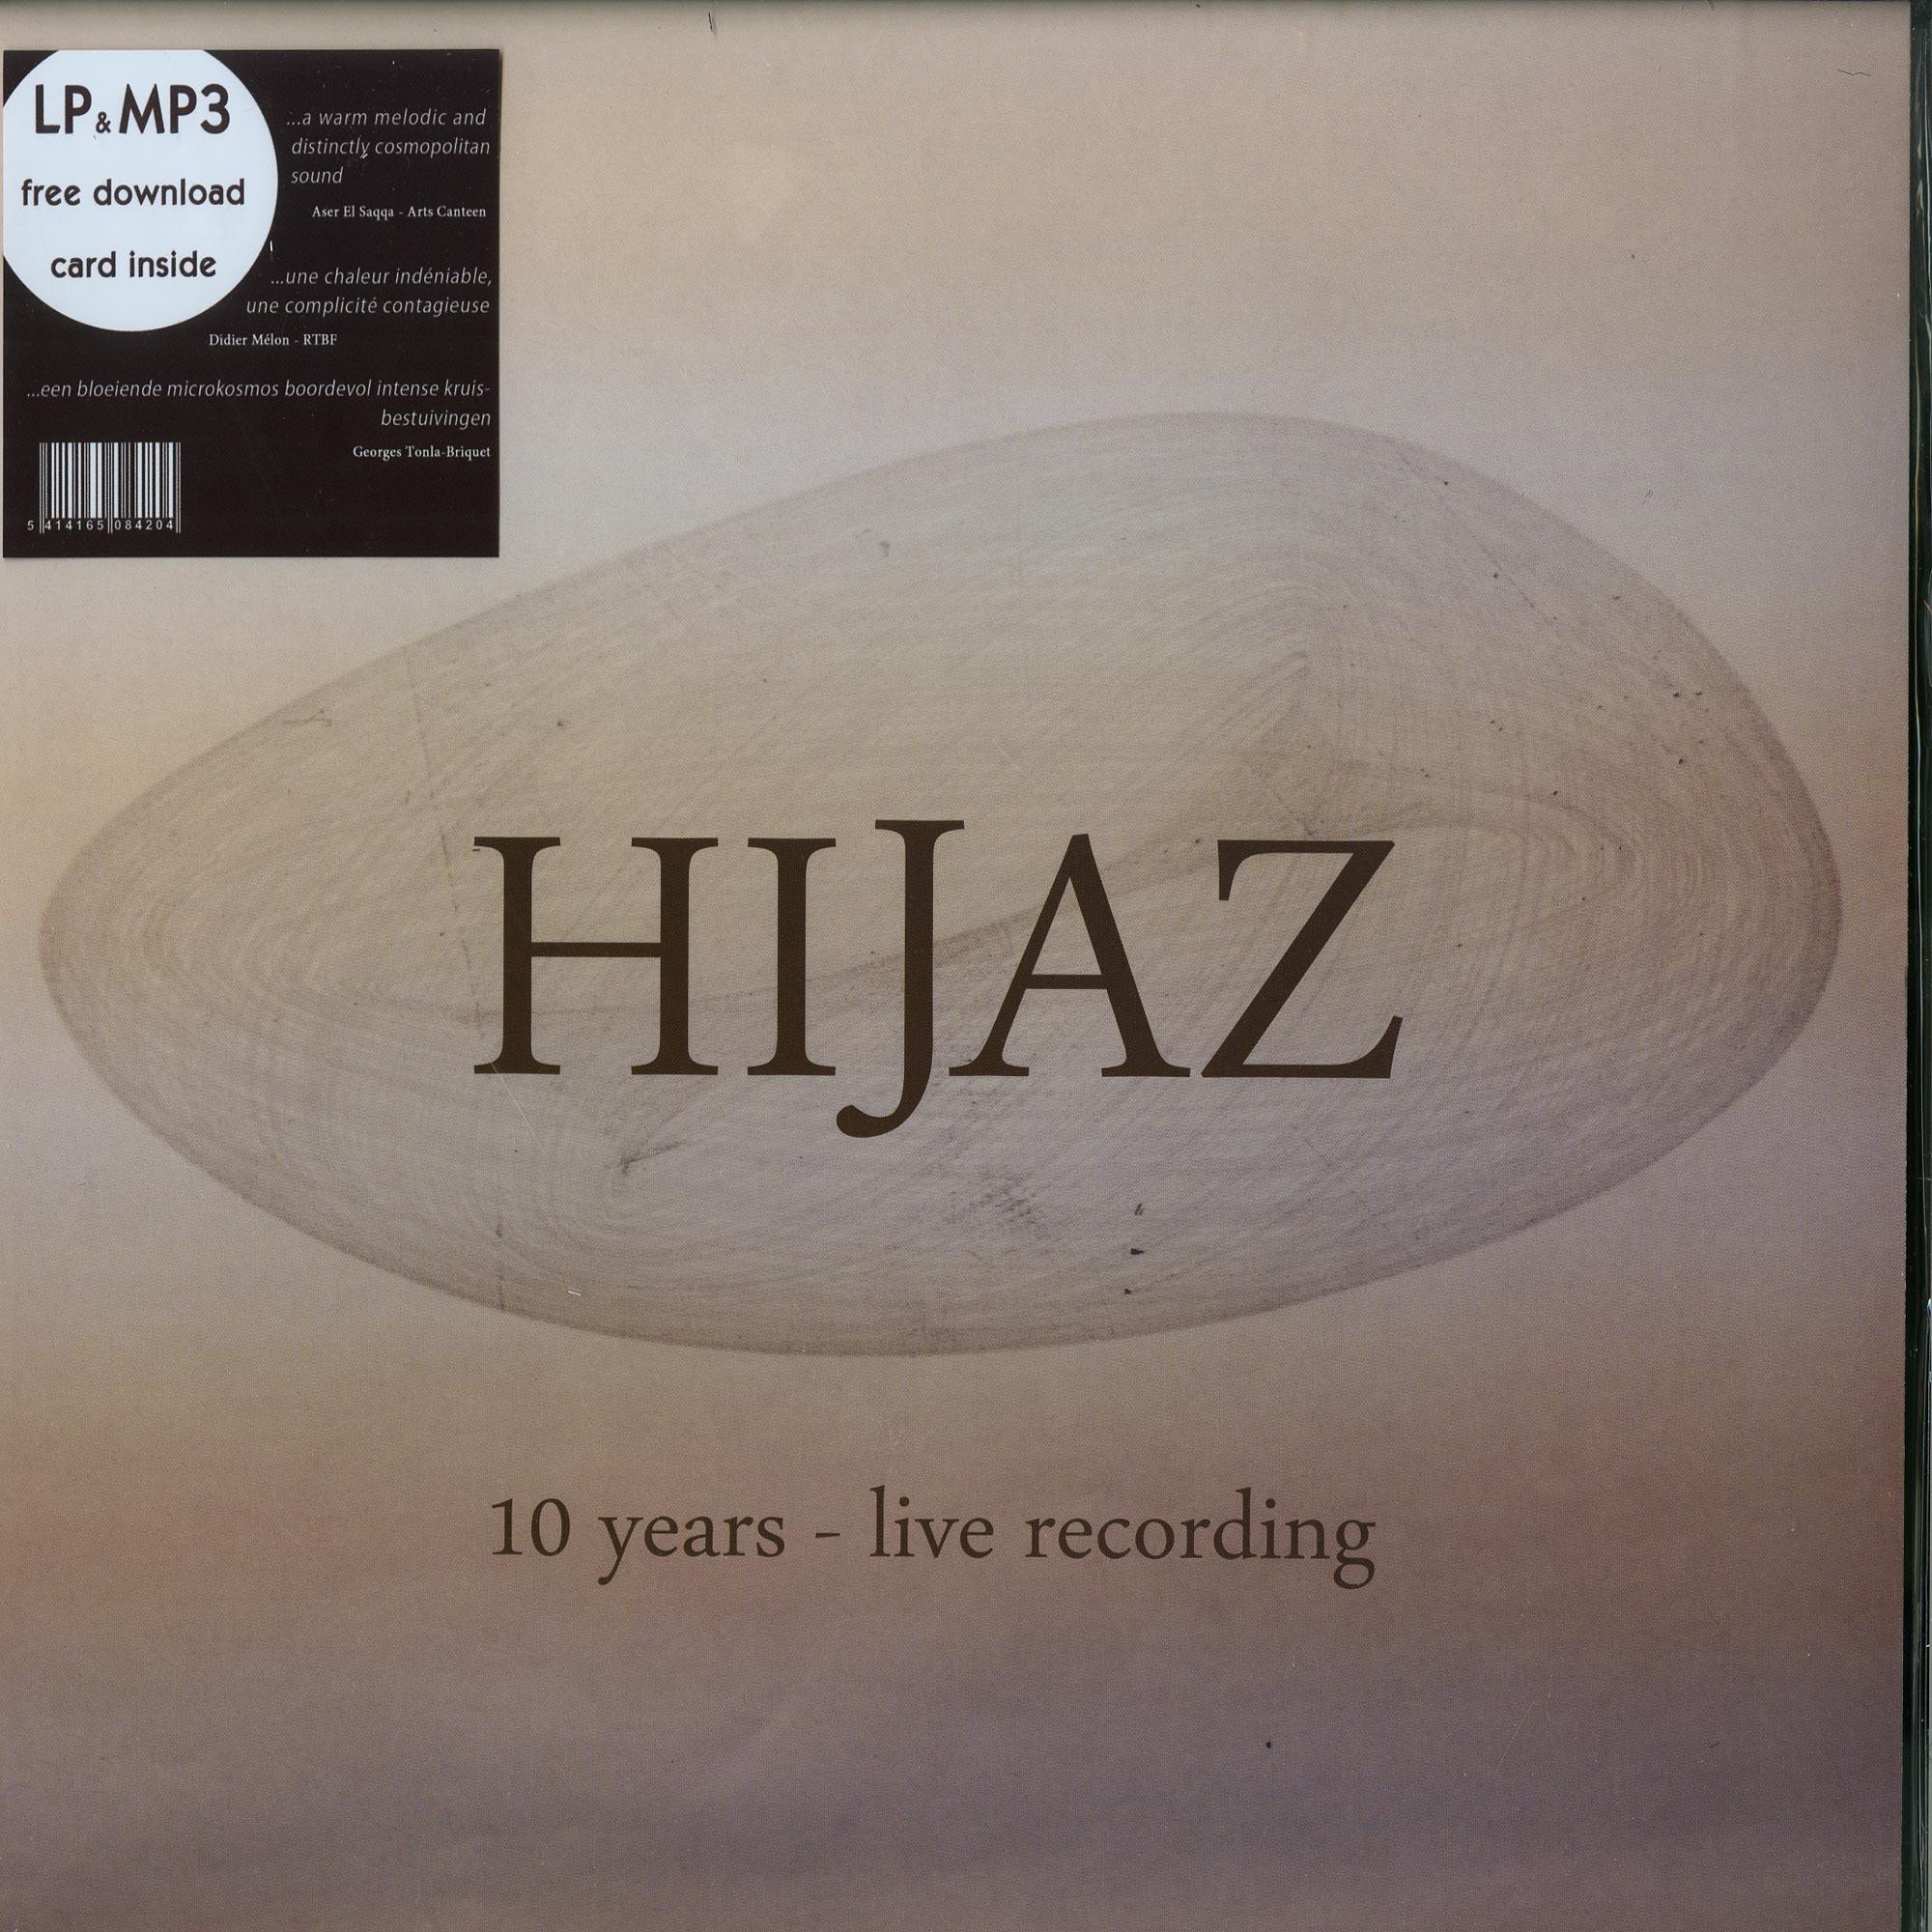 Hijaz - 10 YEARS - LIVE RECORDING